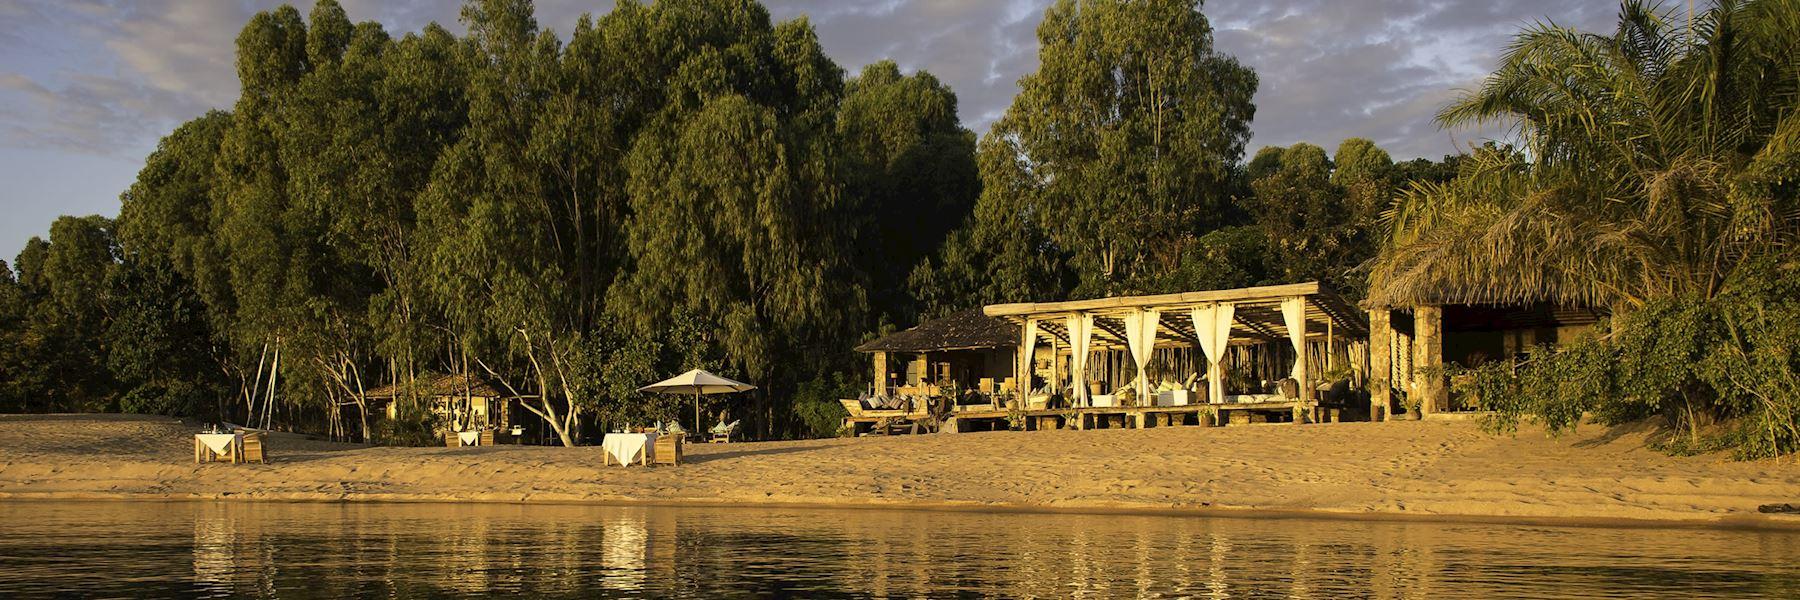 Accommodation in Malawi